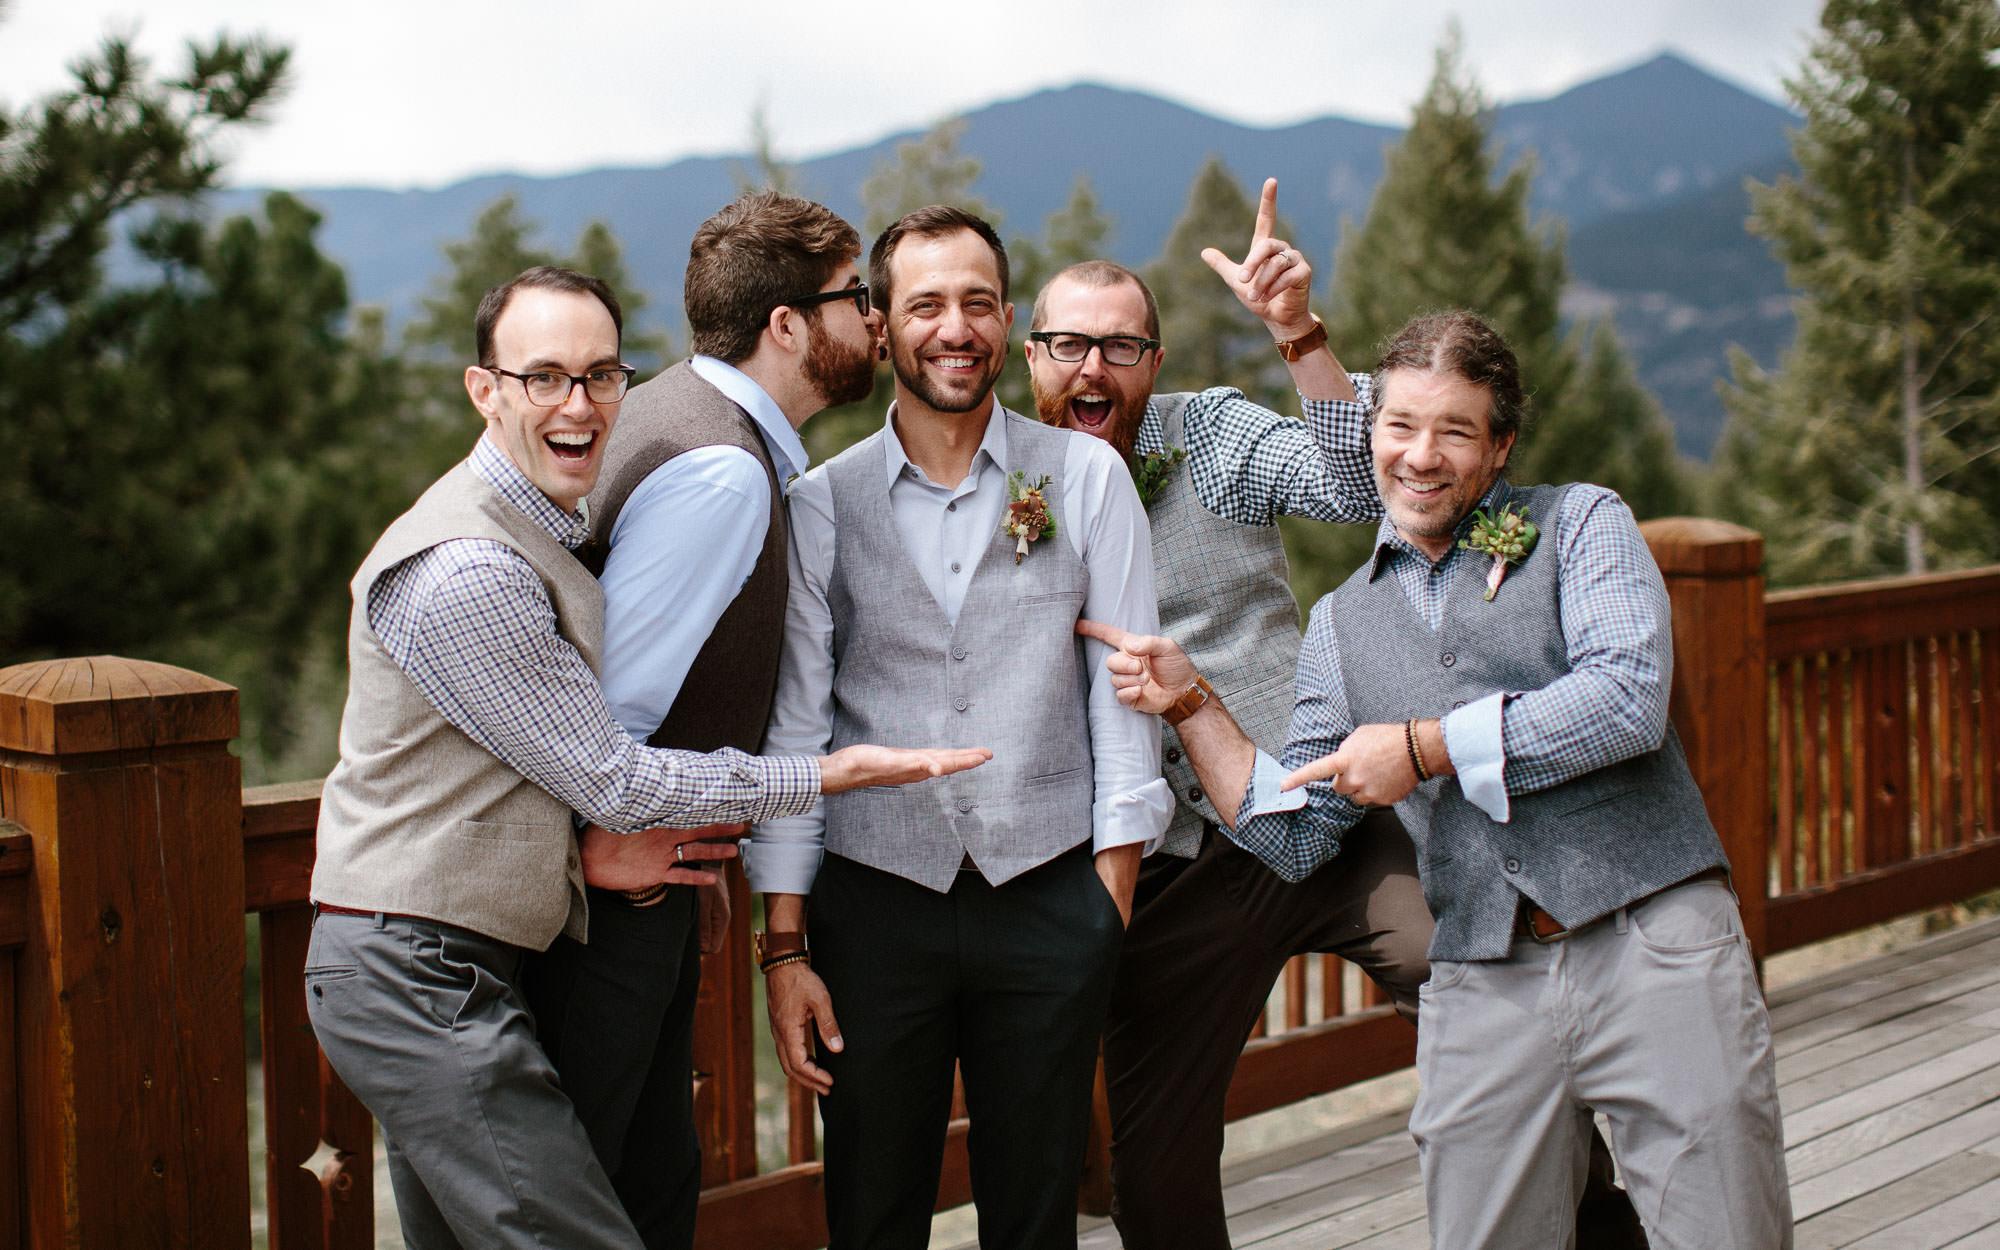 bucci-barn-wedding-elopement-evergreen-boulder-denver-colorado-adventerous-romantic-timeless-055.jpg